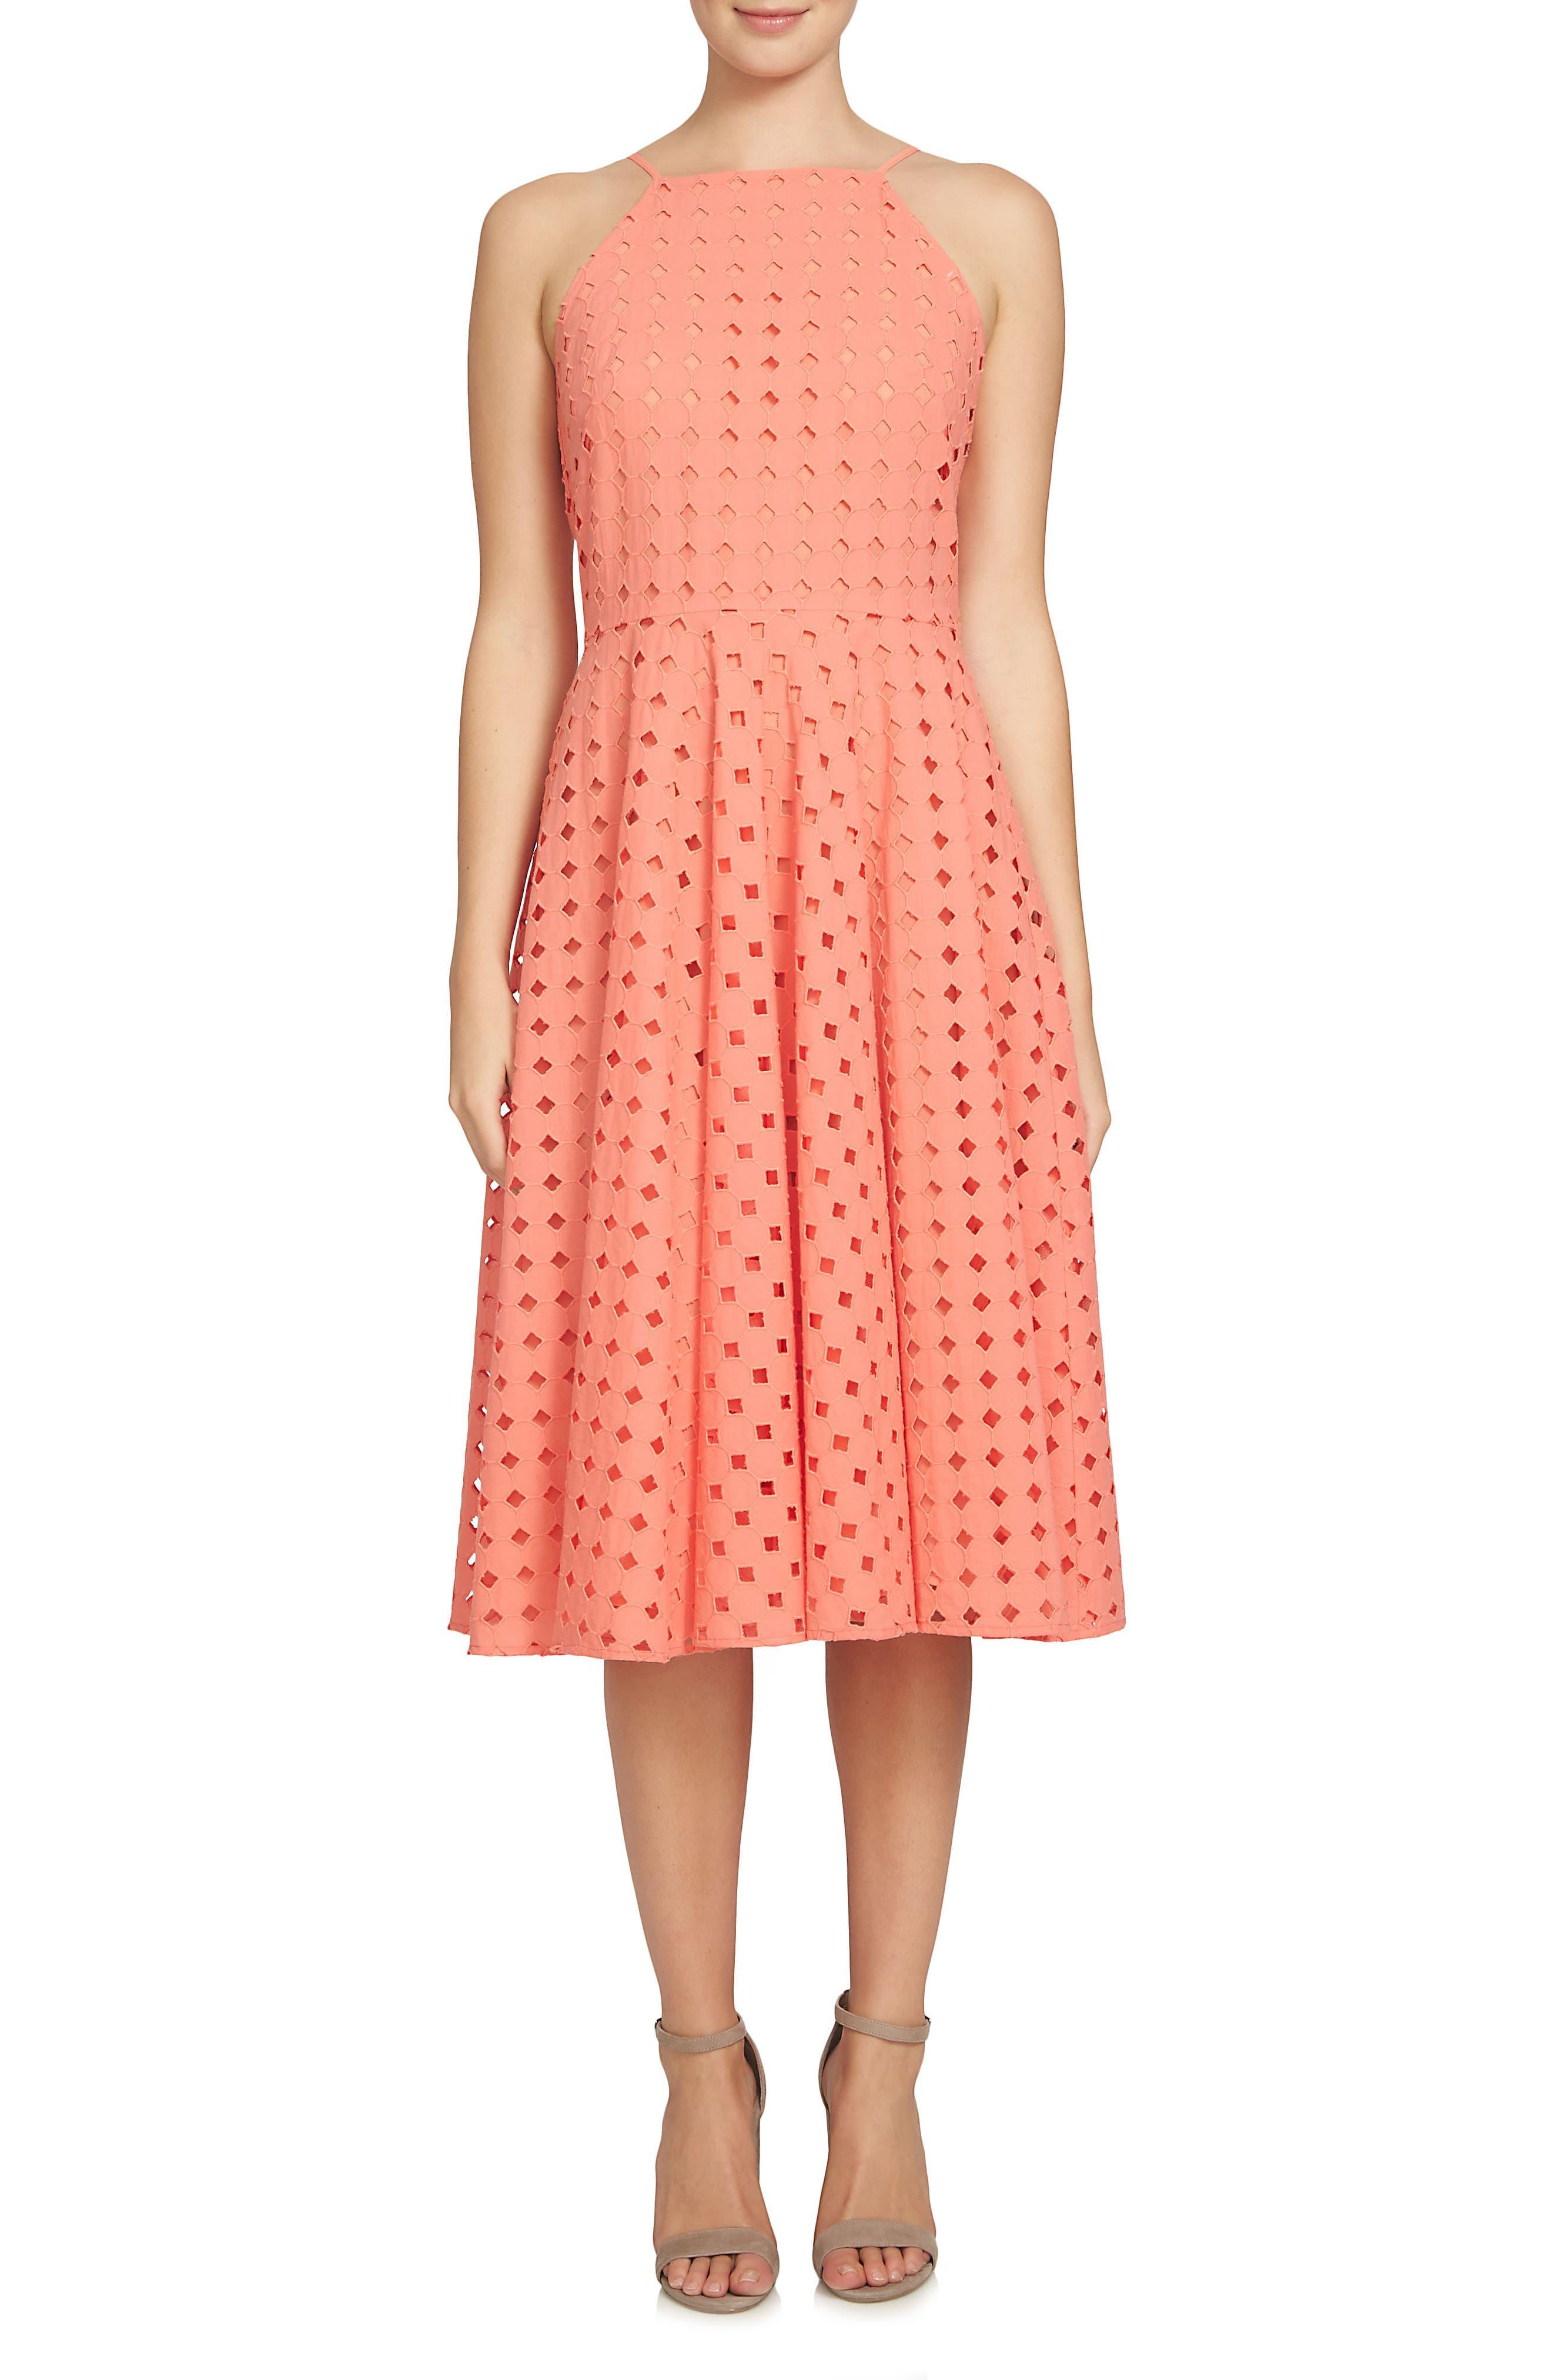 Alternate Image 1 Selected - CeCe Bella Fit & Flare Dress (Regular & Petite)